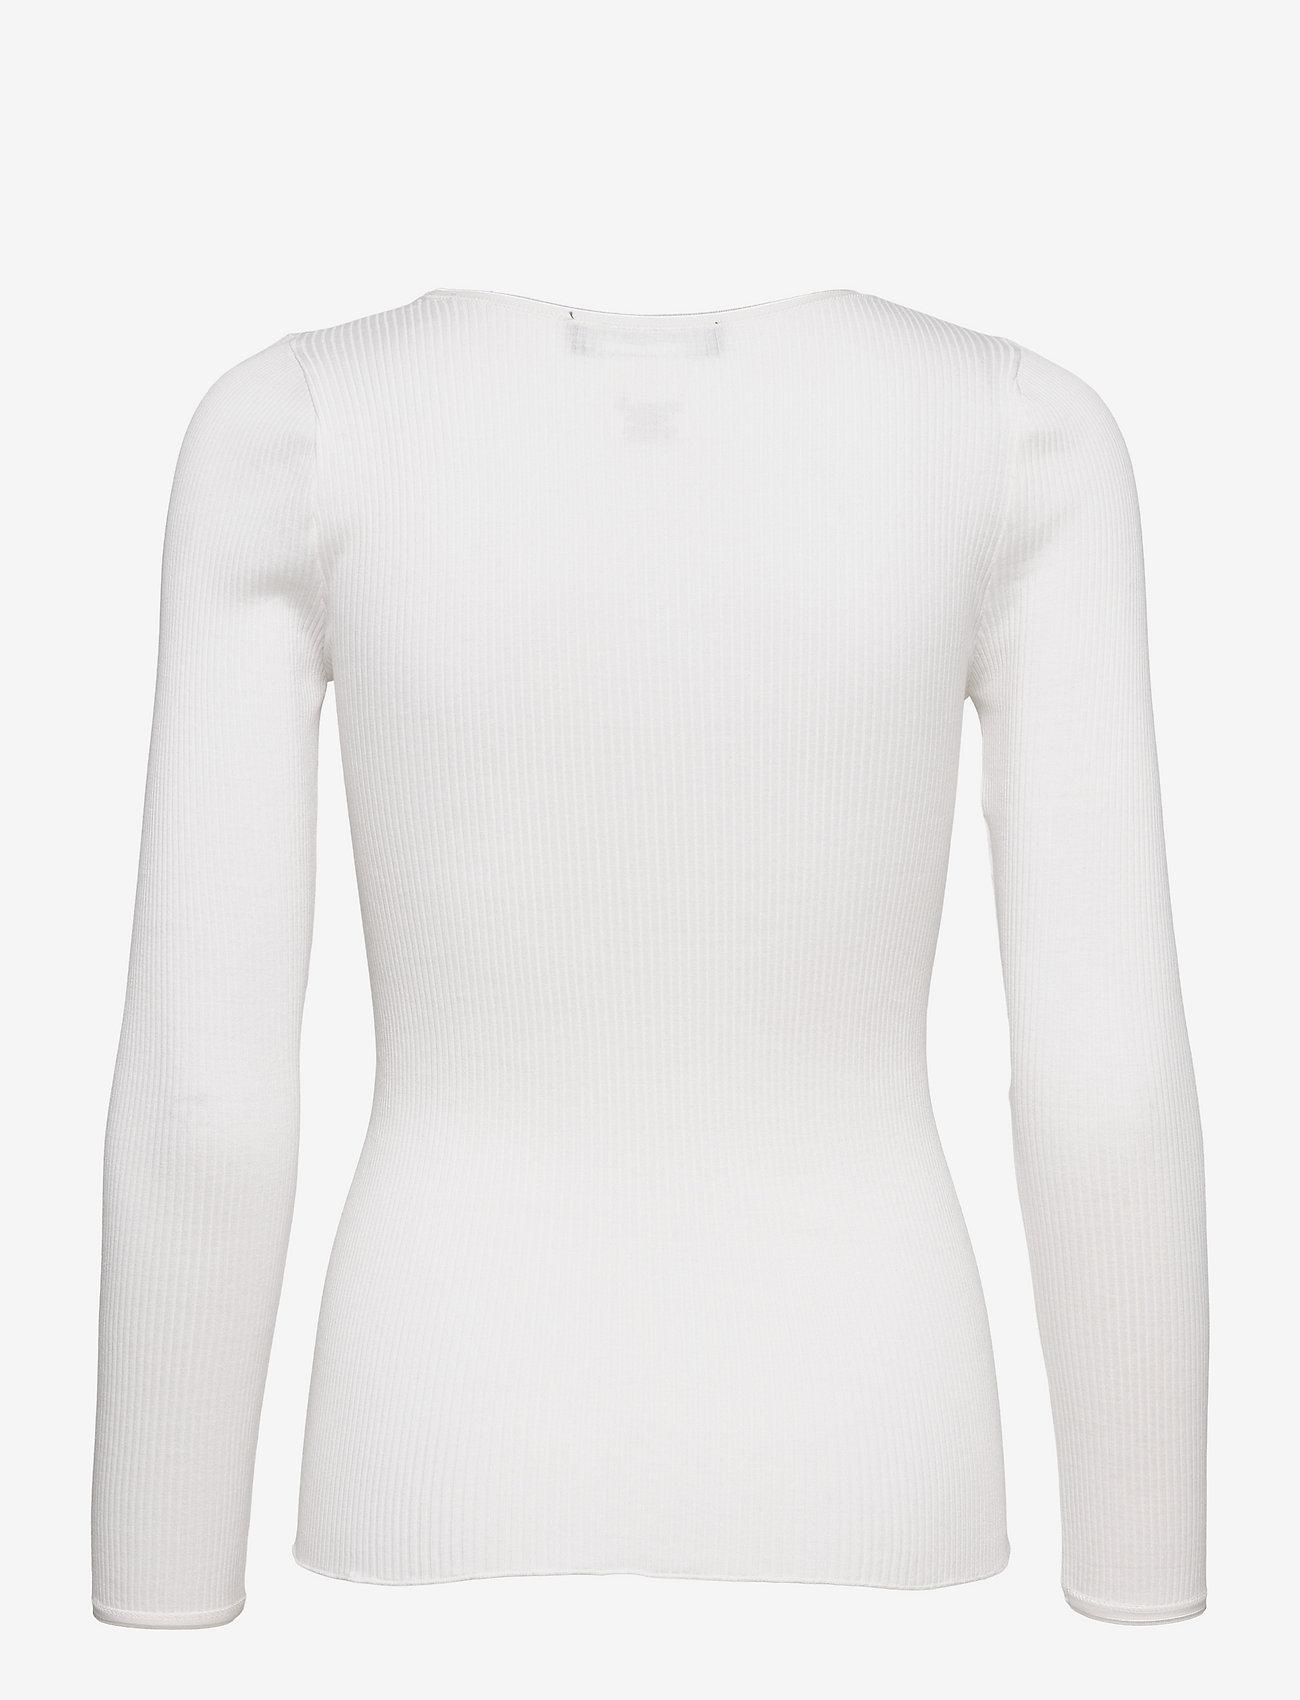 Rosemunde - Silk t-shirt w/ elastic band - långärmade toppar - new white - 1